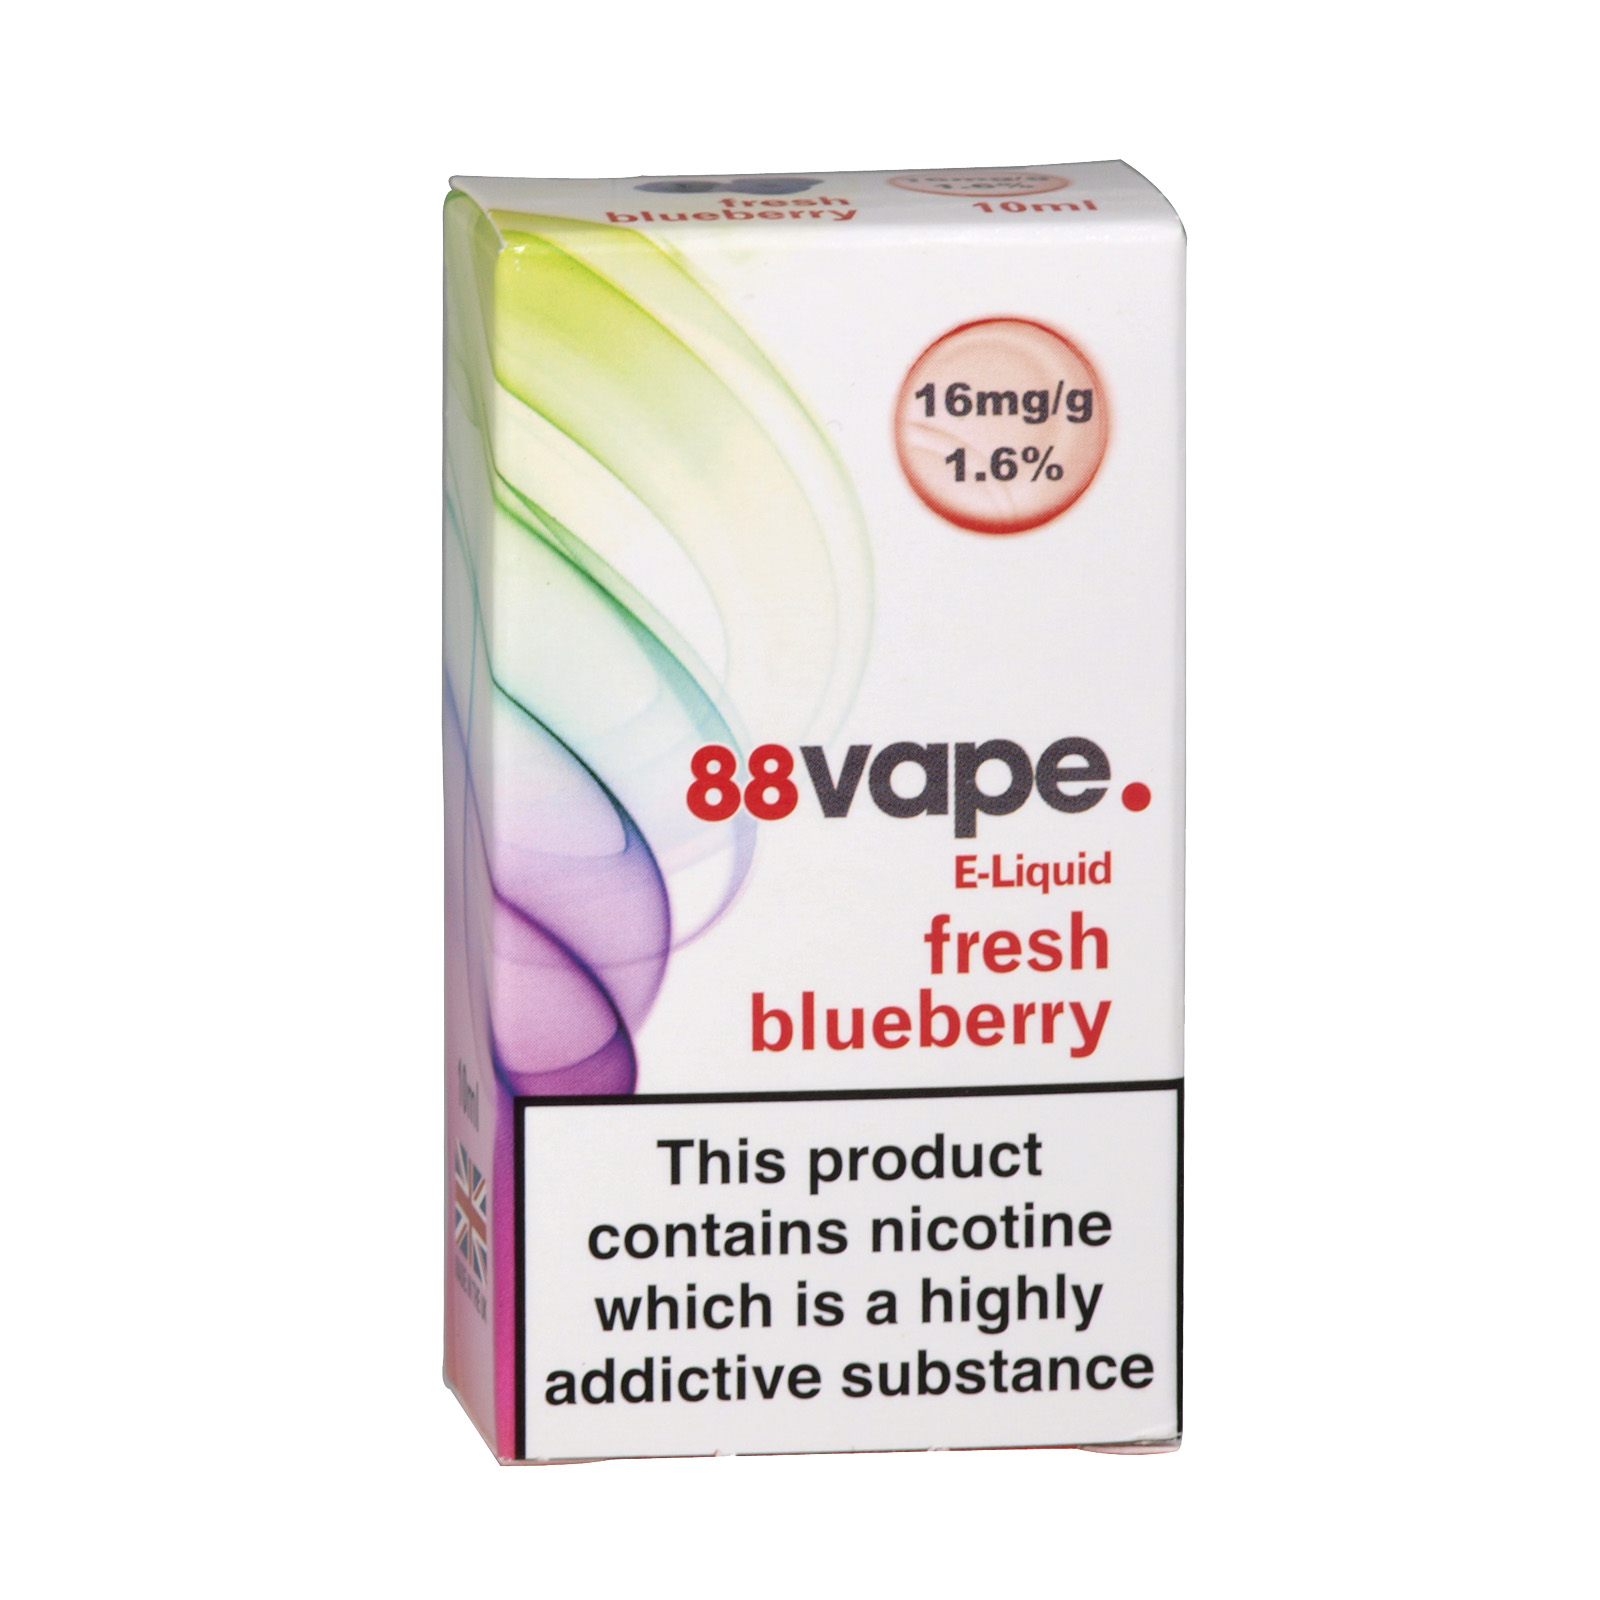 88VAPE 10ML E-LIQUID 16MG FRESH BLUEBERRY